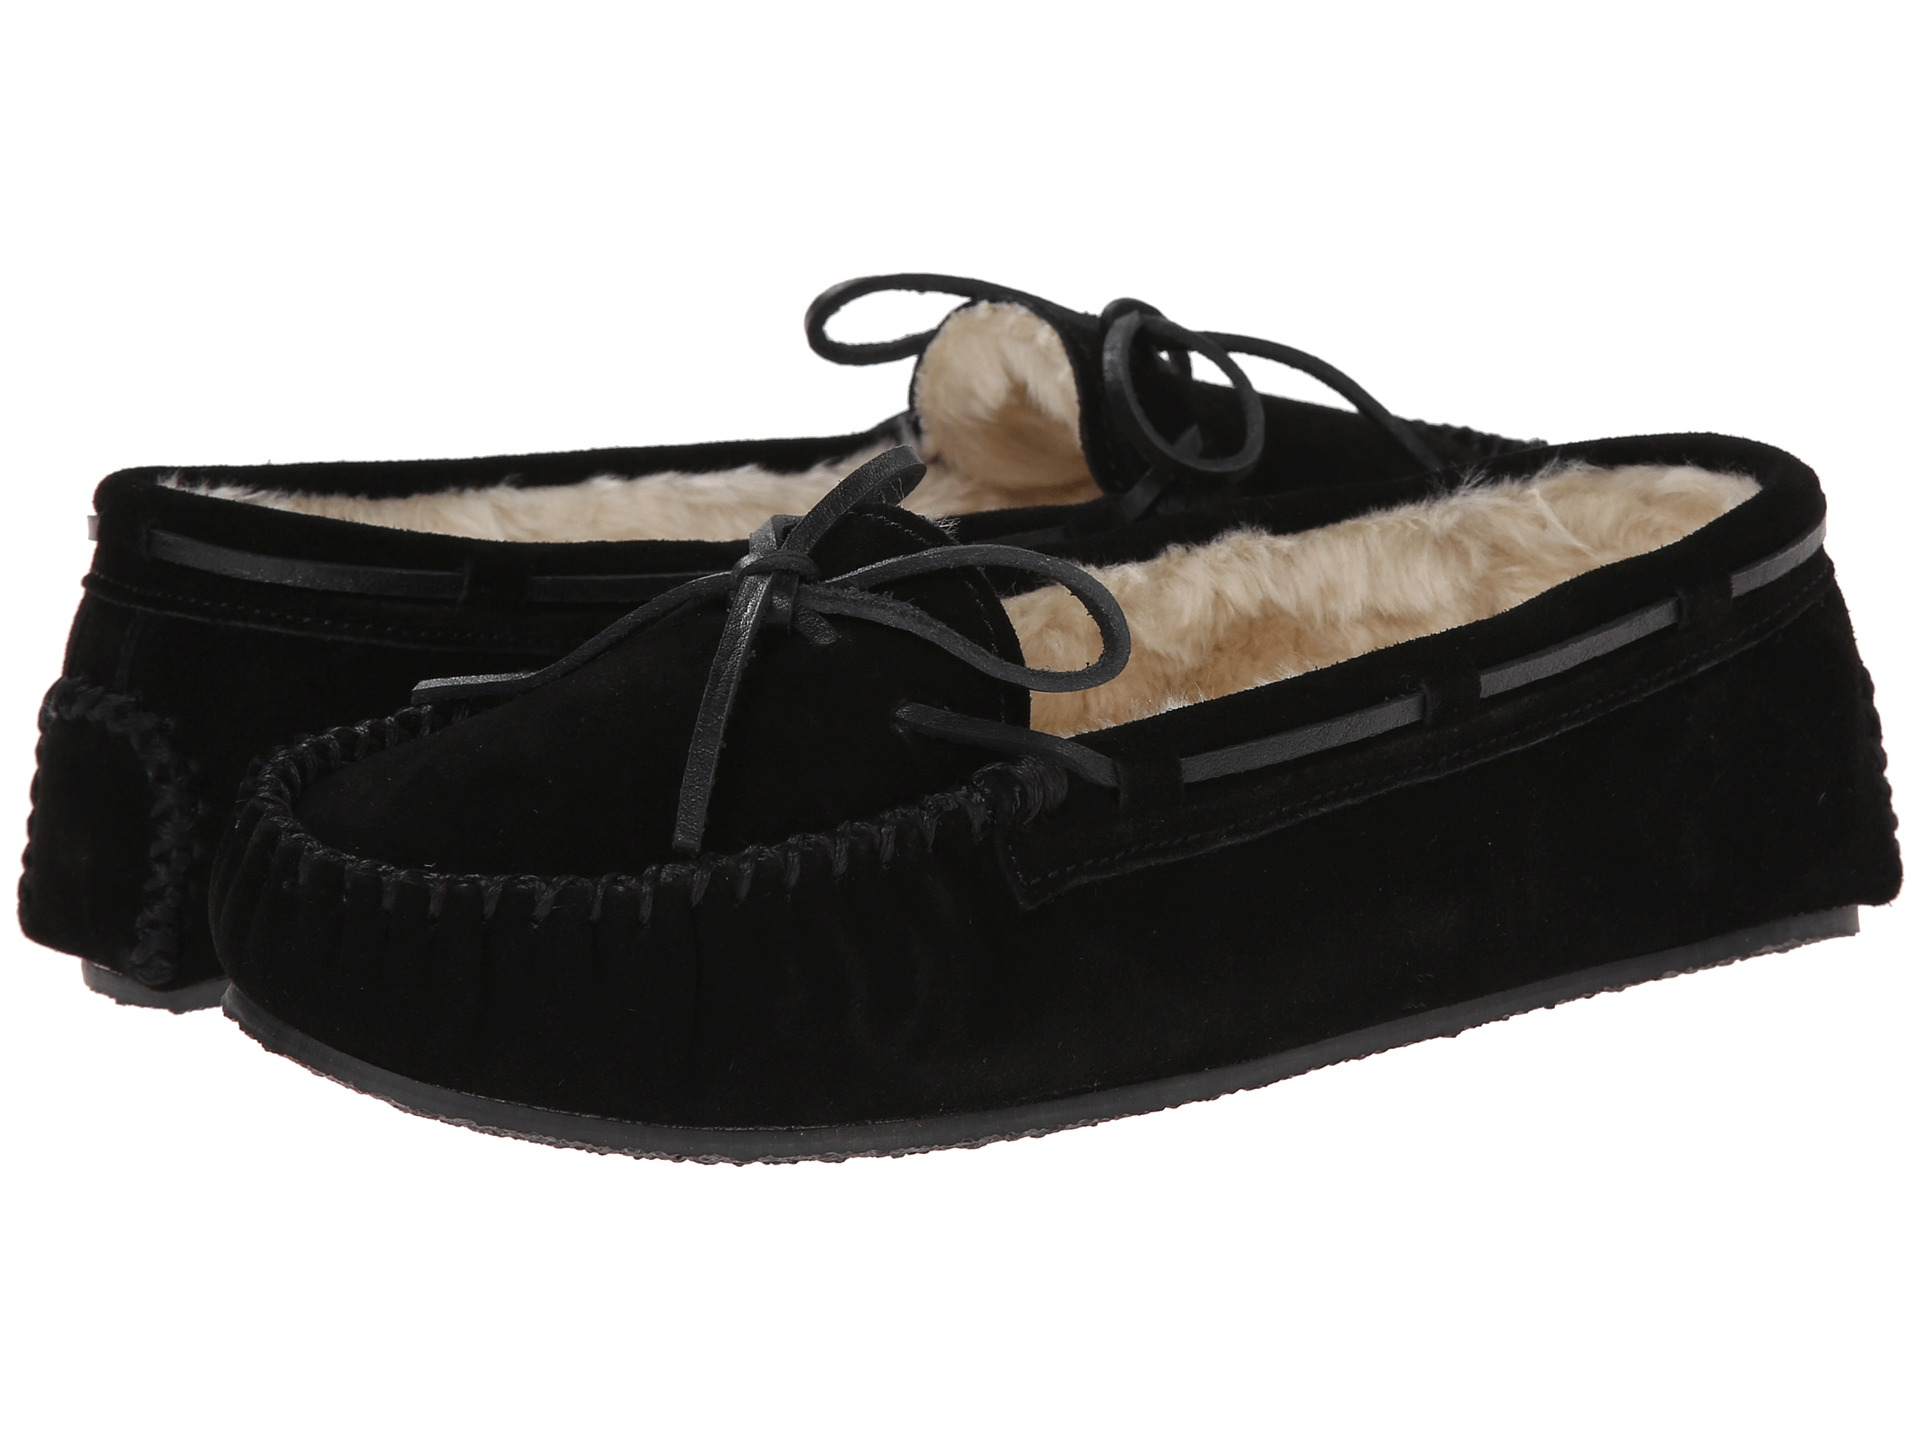 Minnetonka Shoes Sale Online